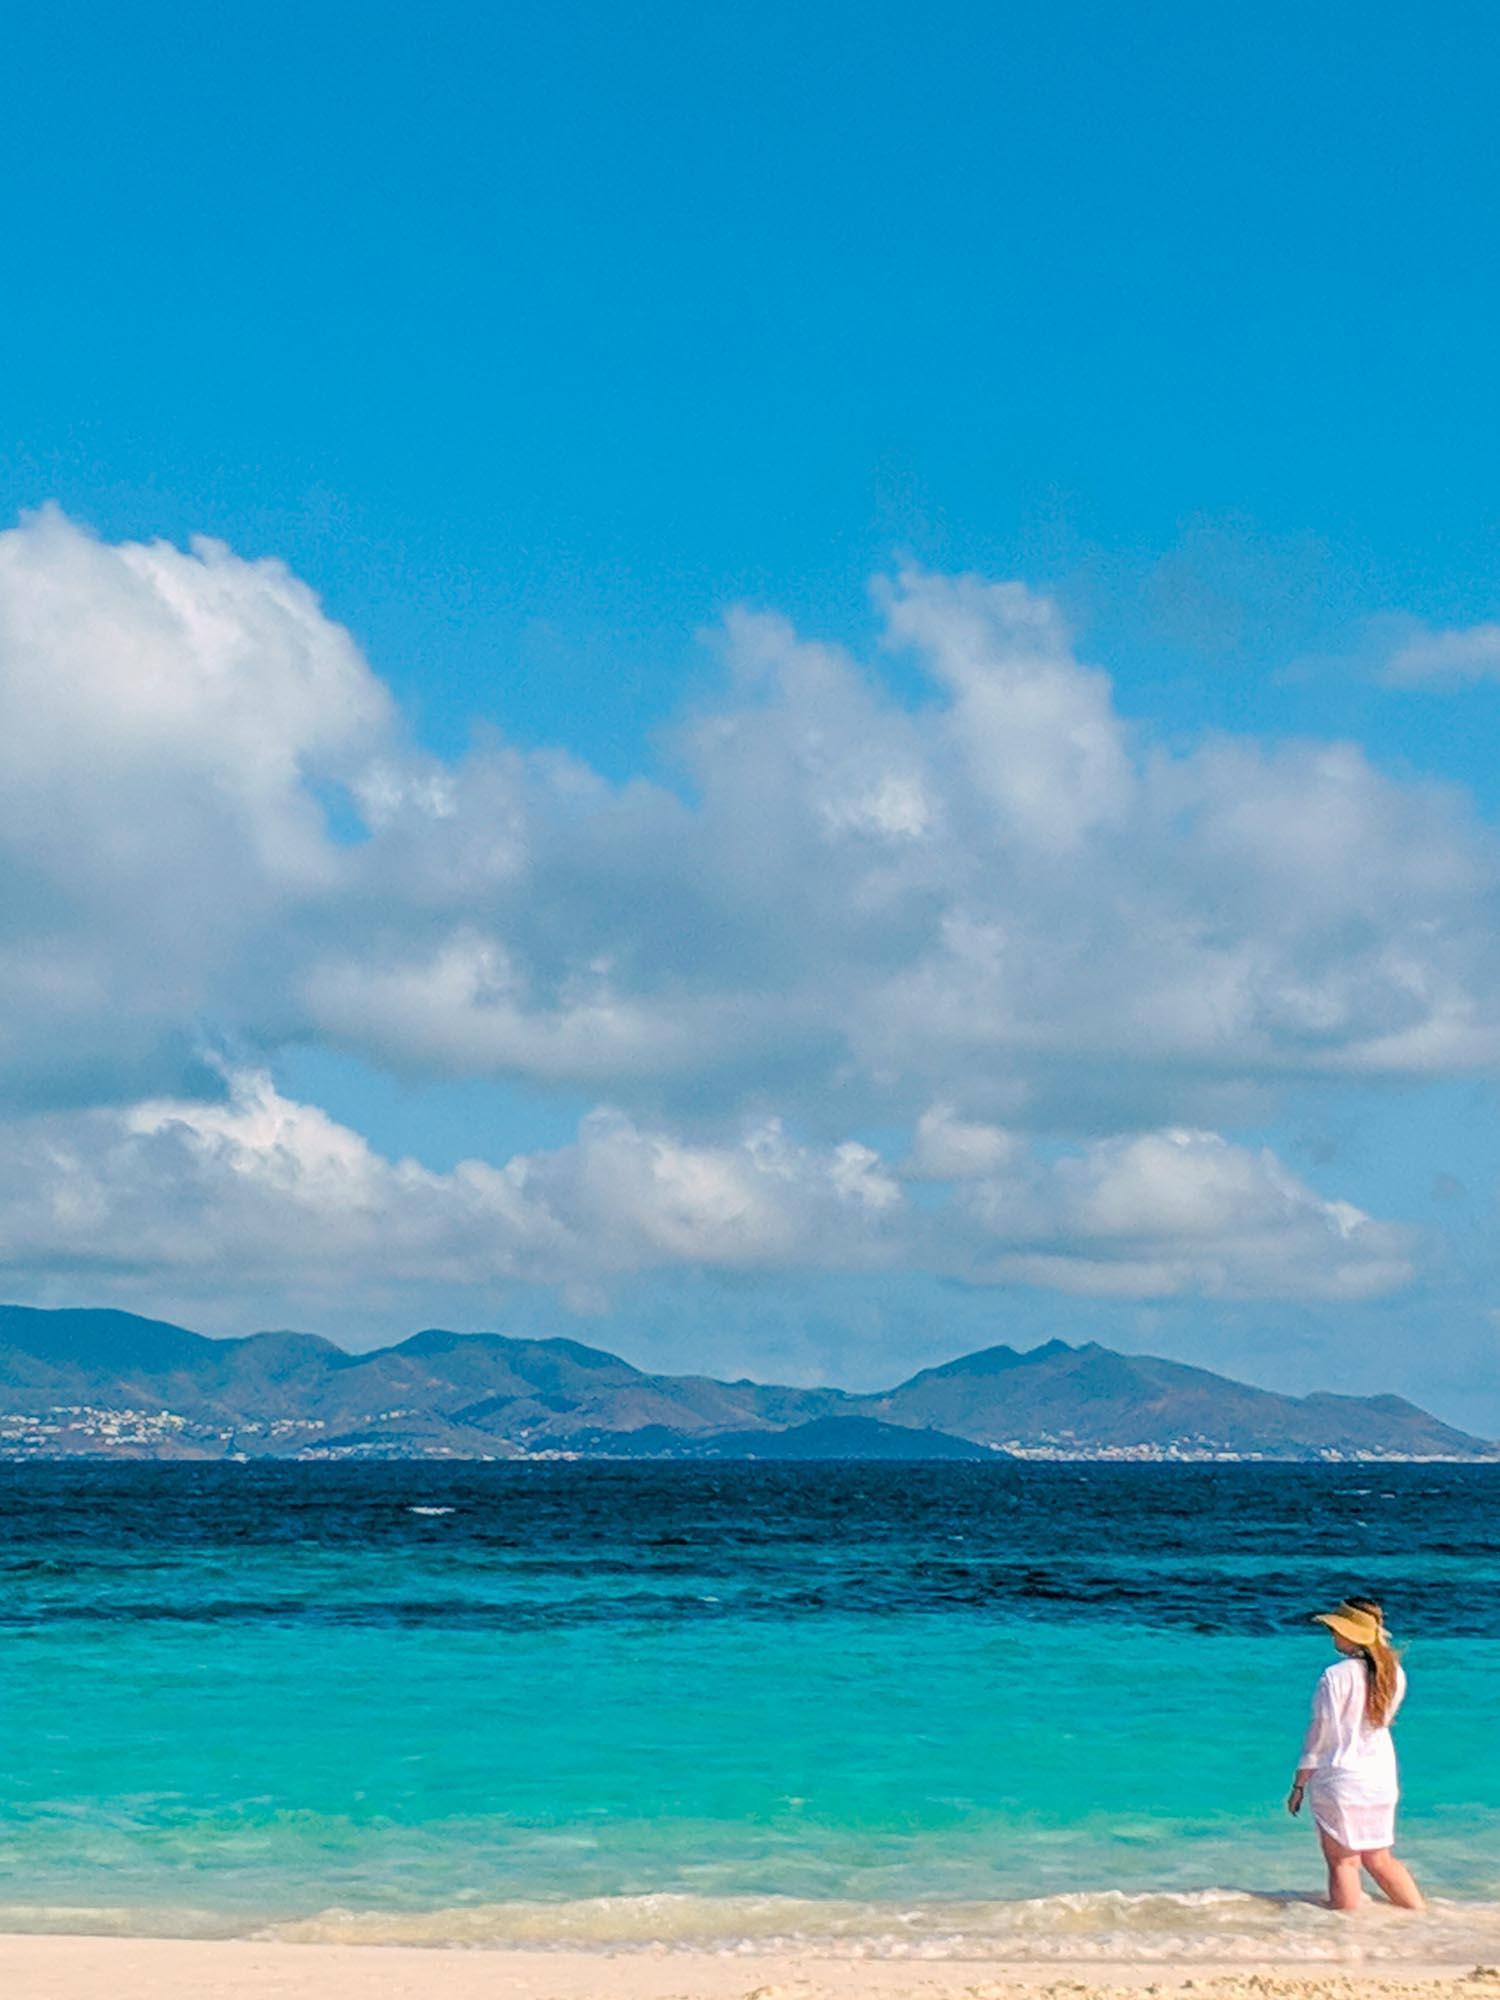 50 Best Caribbean Beaches as Chosen by Travel Bloggers